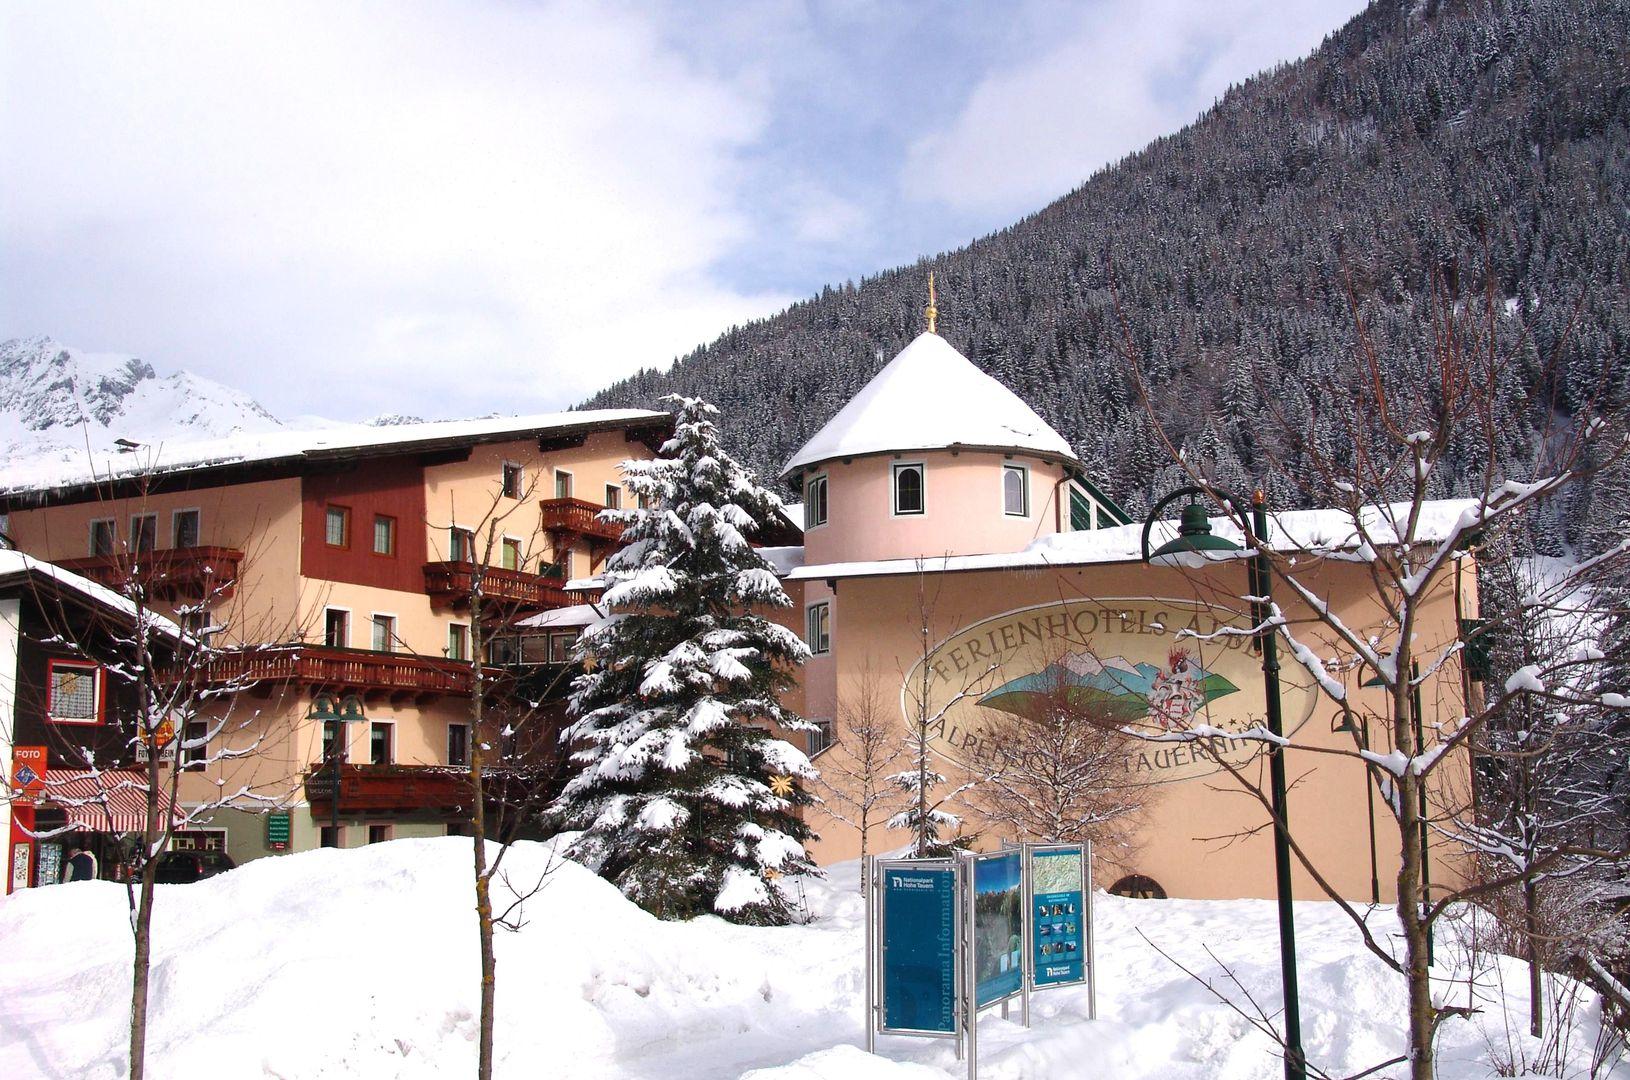 Ferienhotel's Alber